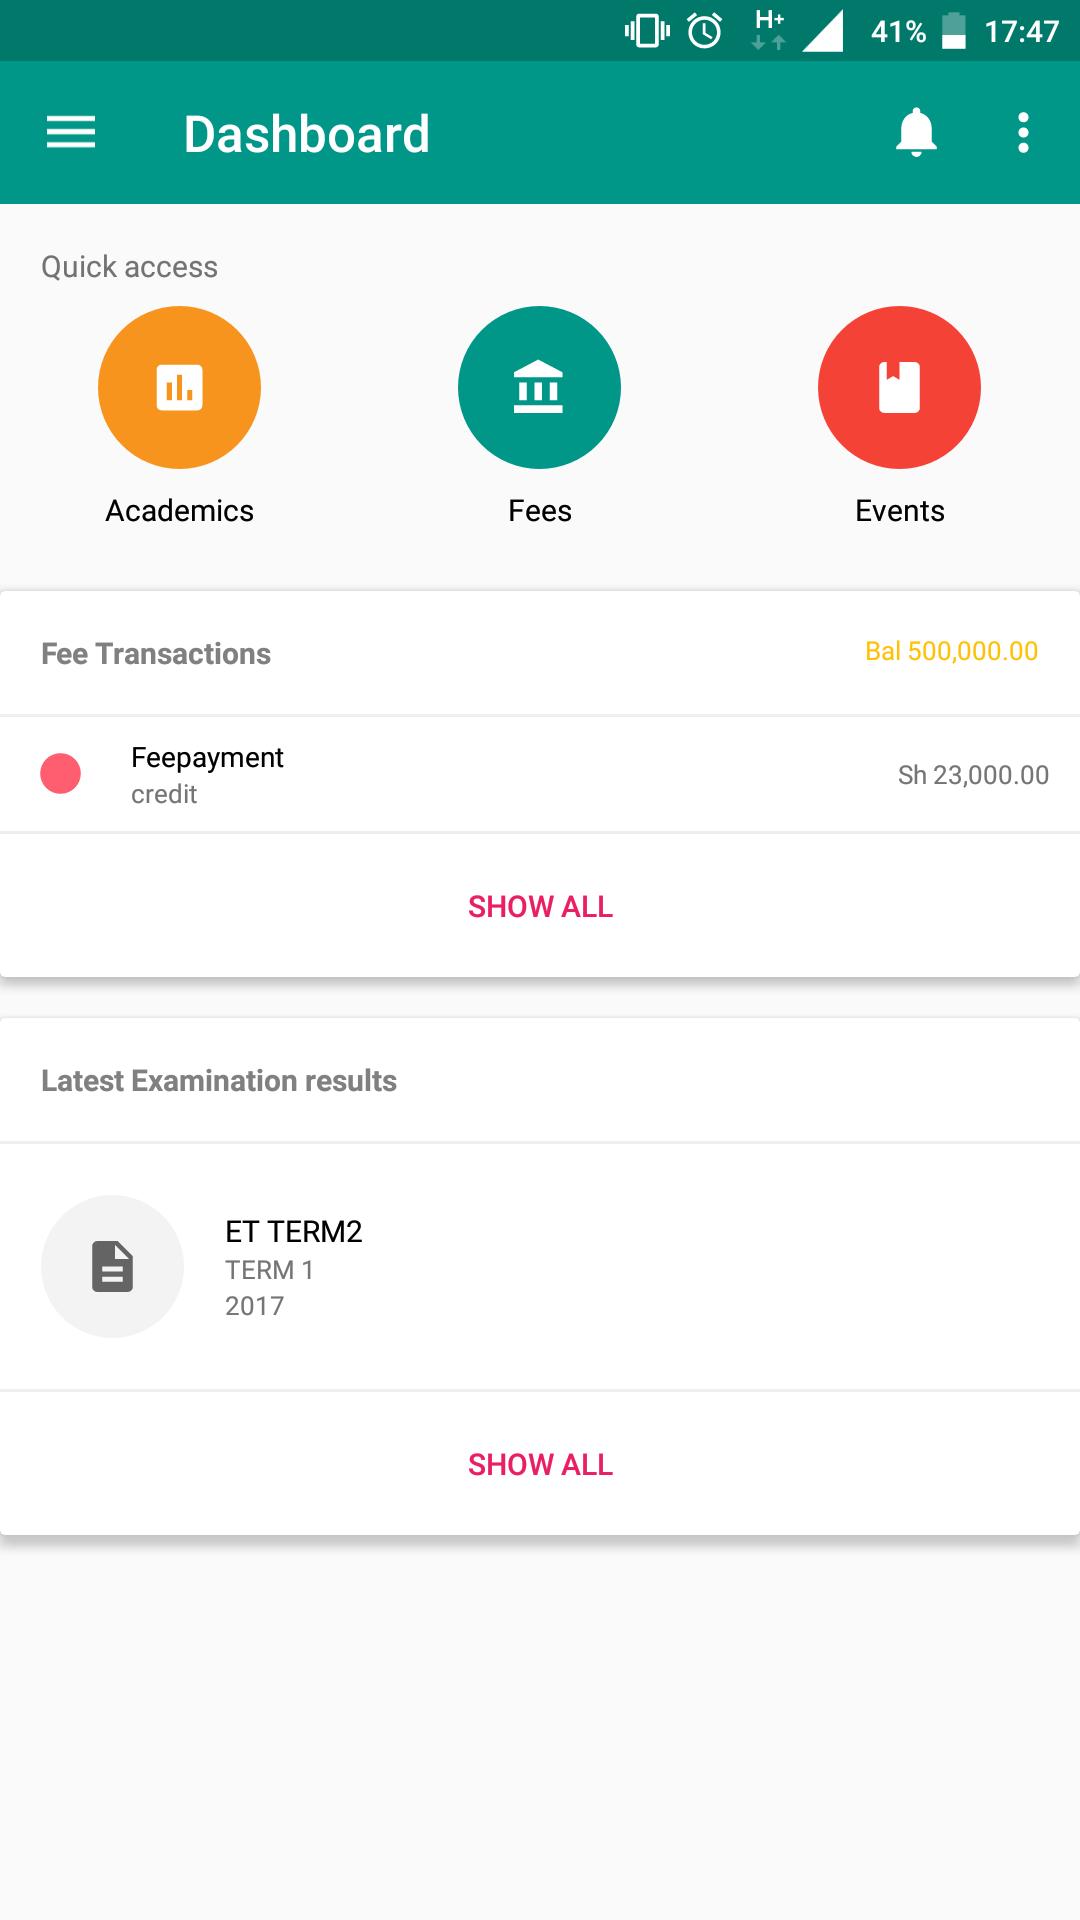 Bunifu Schools Mobile App - Dashboard